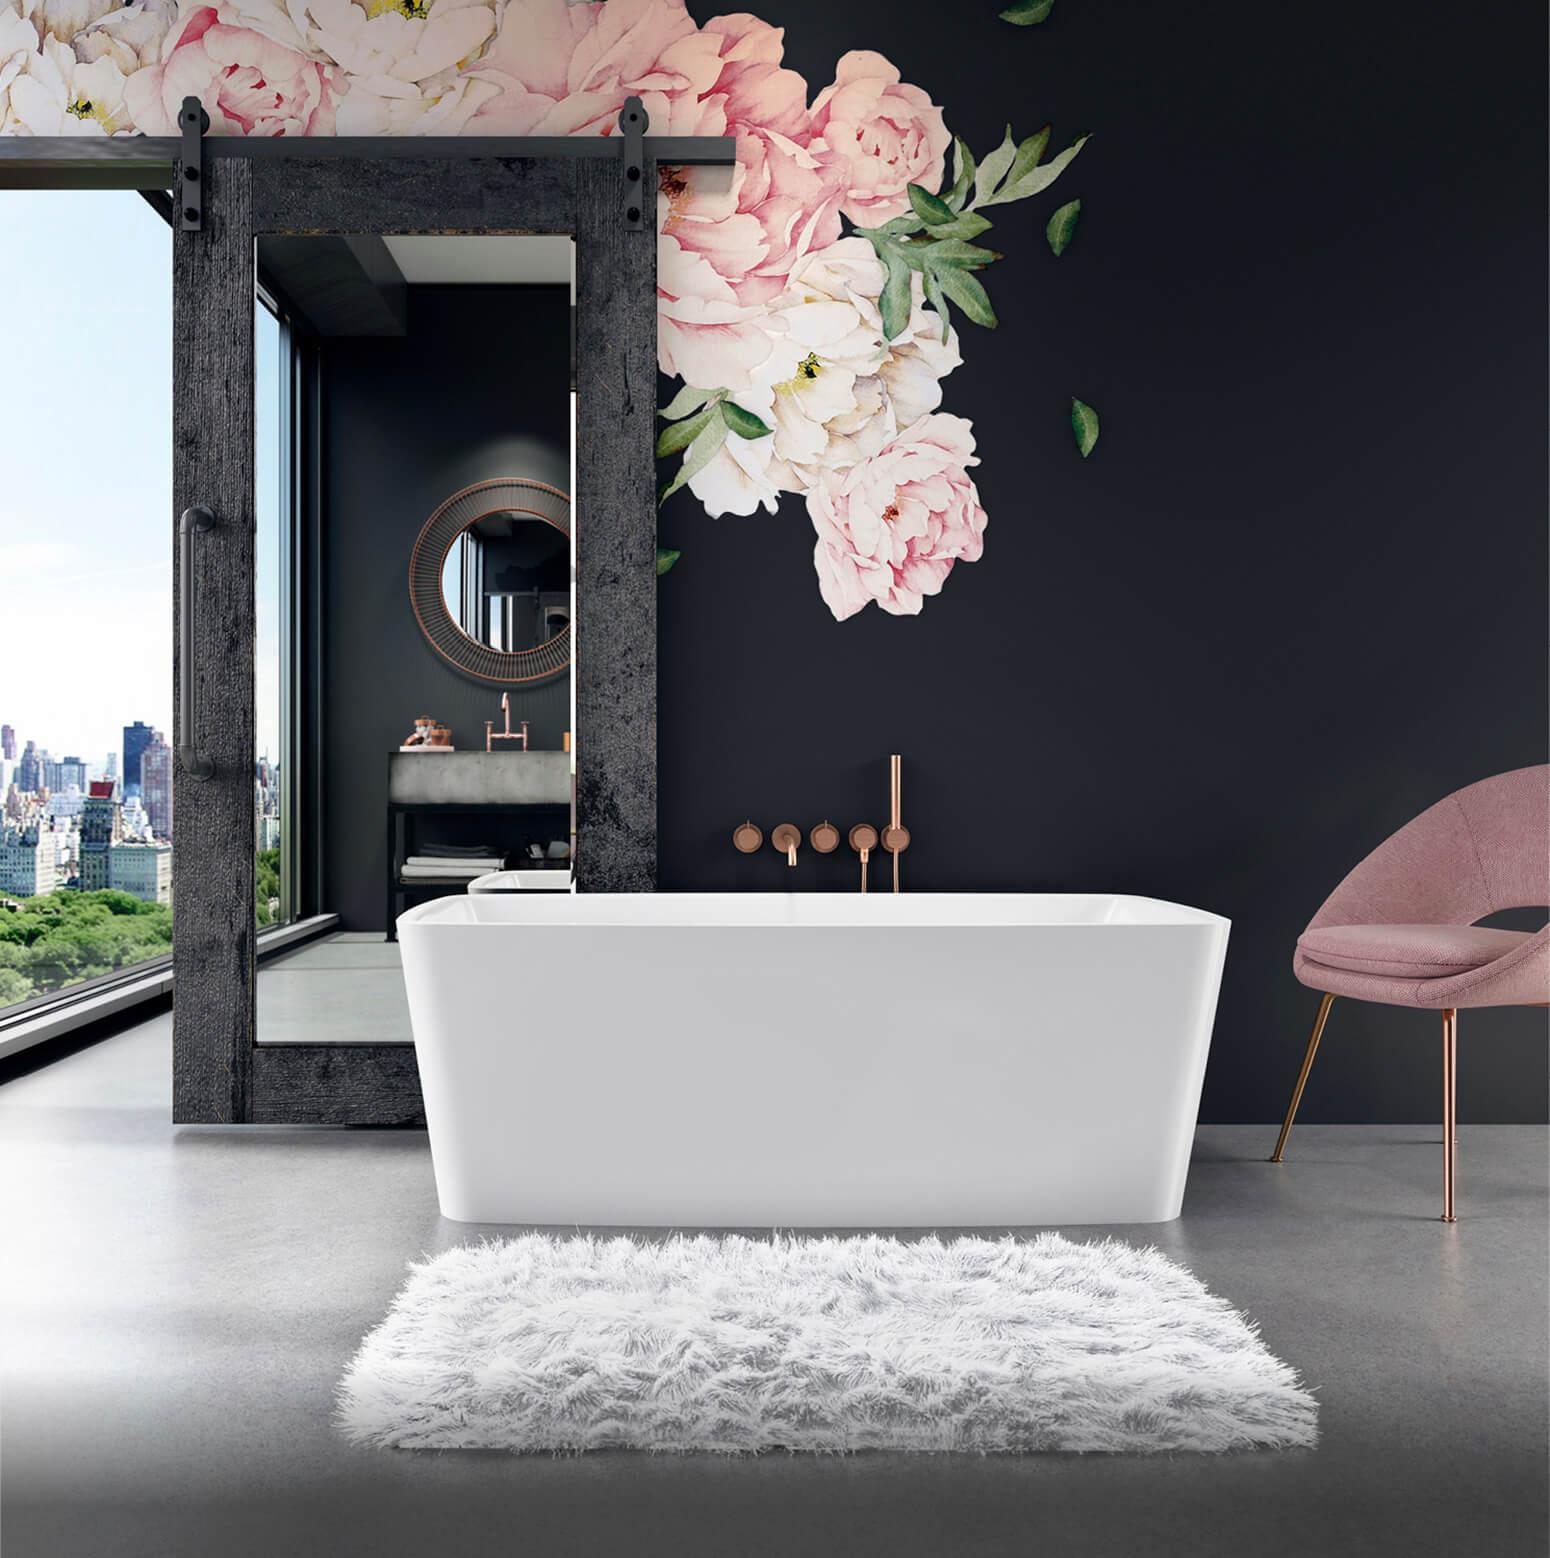 Bainultra Vibe® 5828 Fresstanding air jet bathtub for your modern bathroom